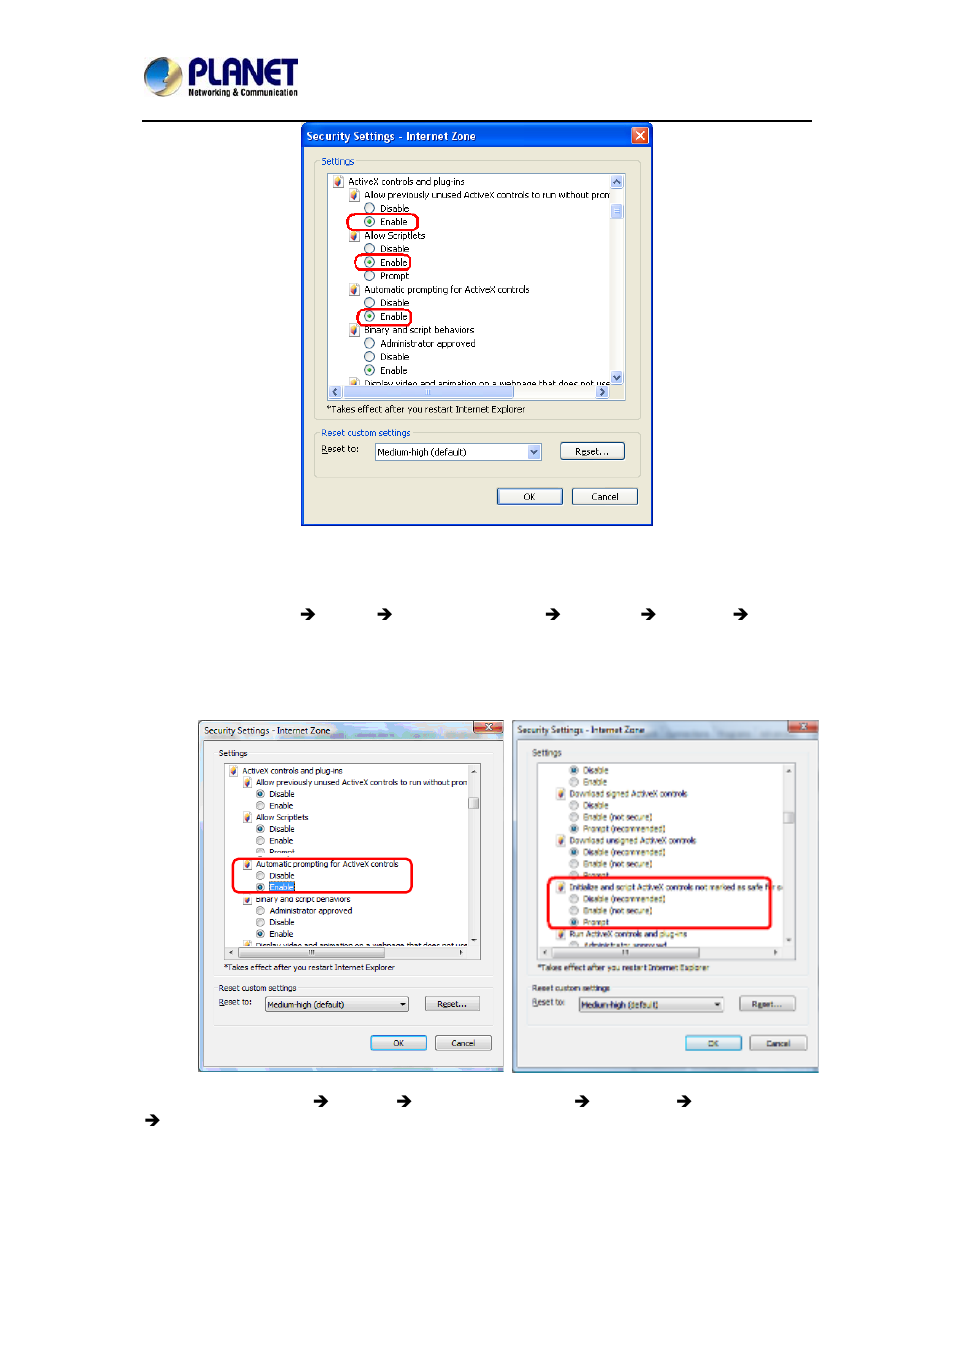 3 internet explorer 7 for windows vista planet ica 3260 user rh manualsdir com windows vista user manual pdf Operators Manual